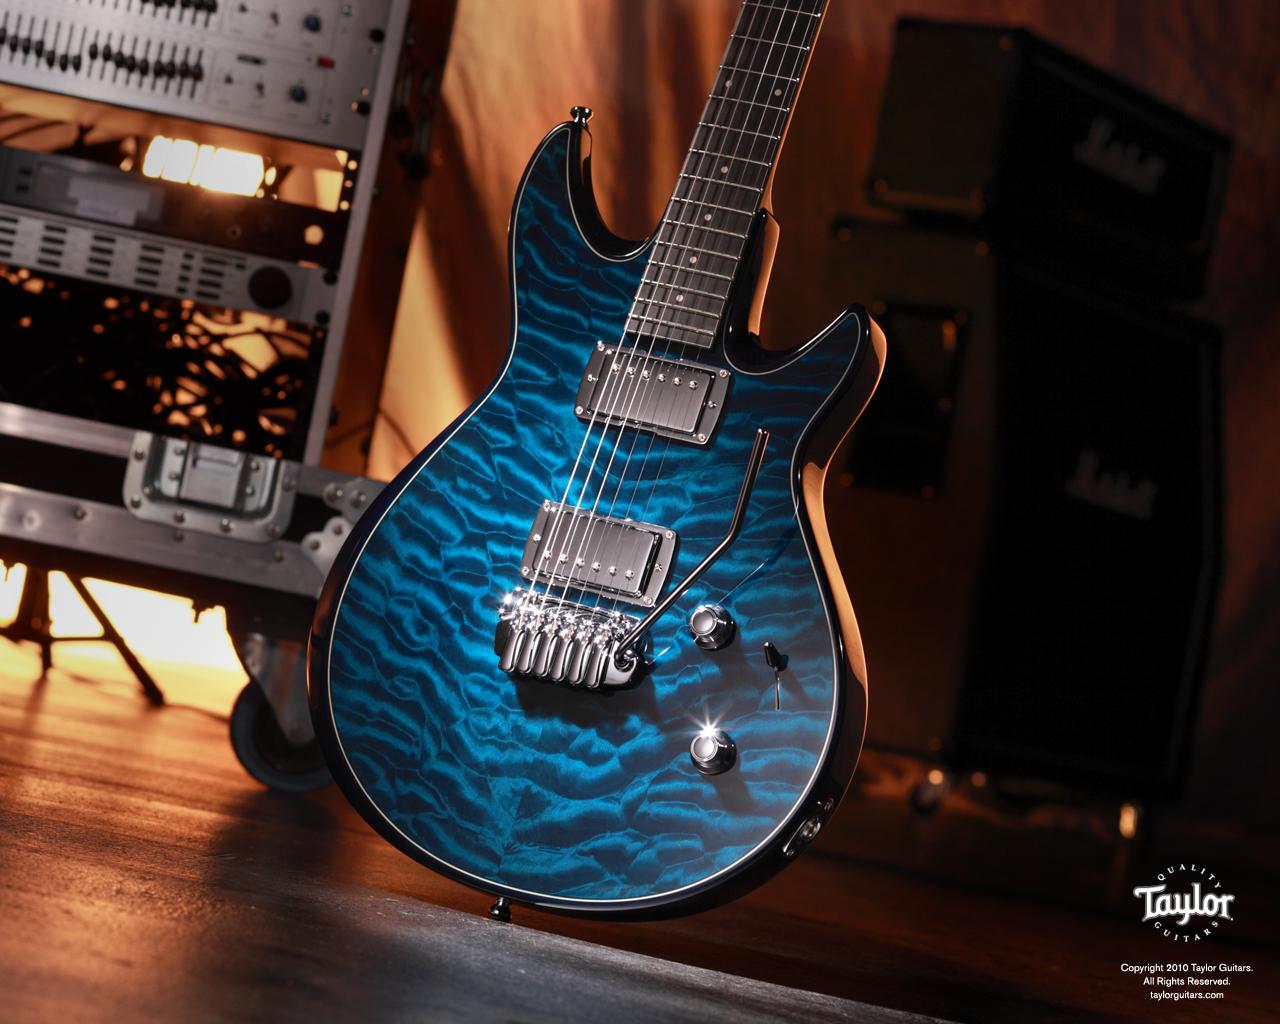 taylor guitars wallpapers - photo #27